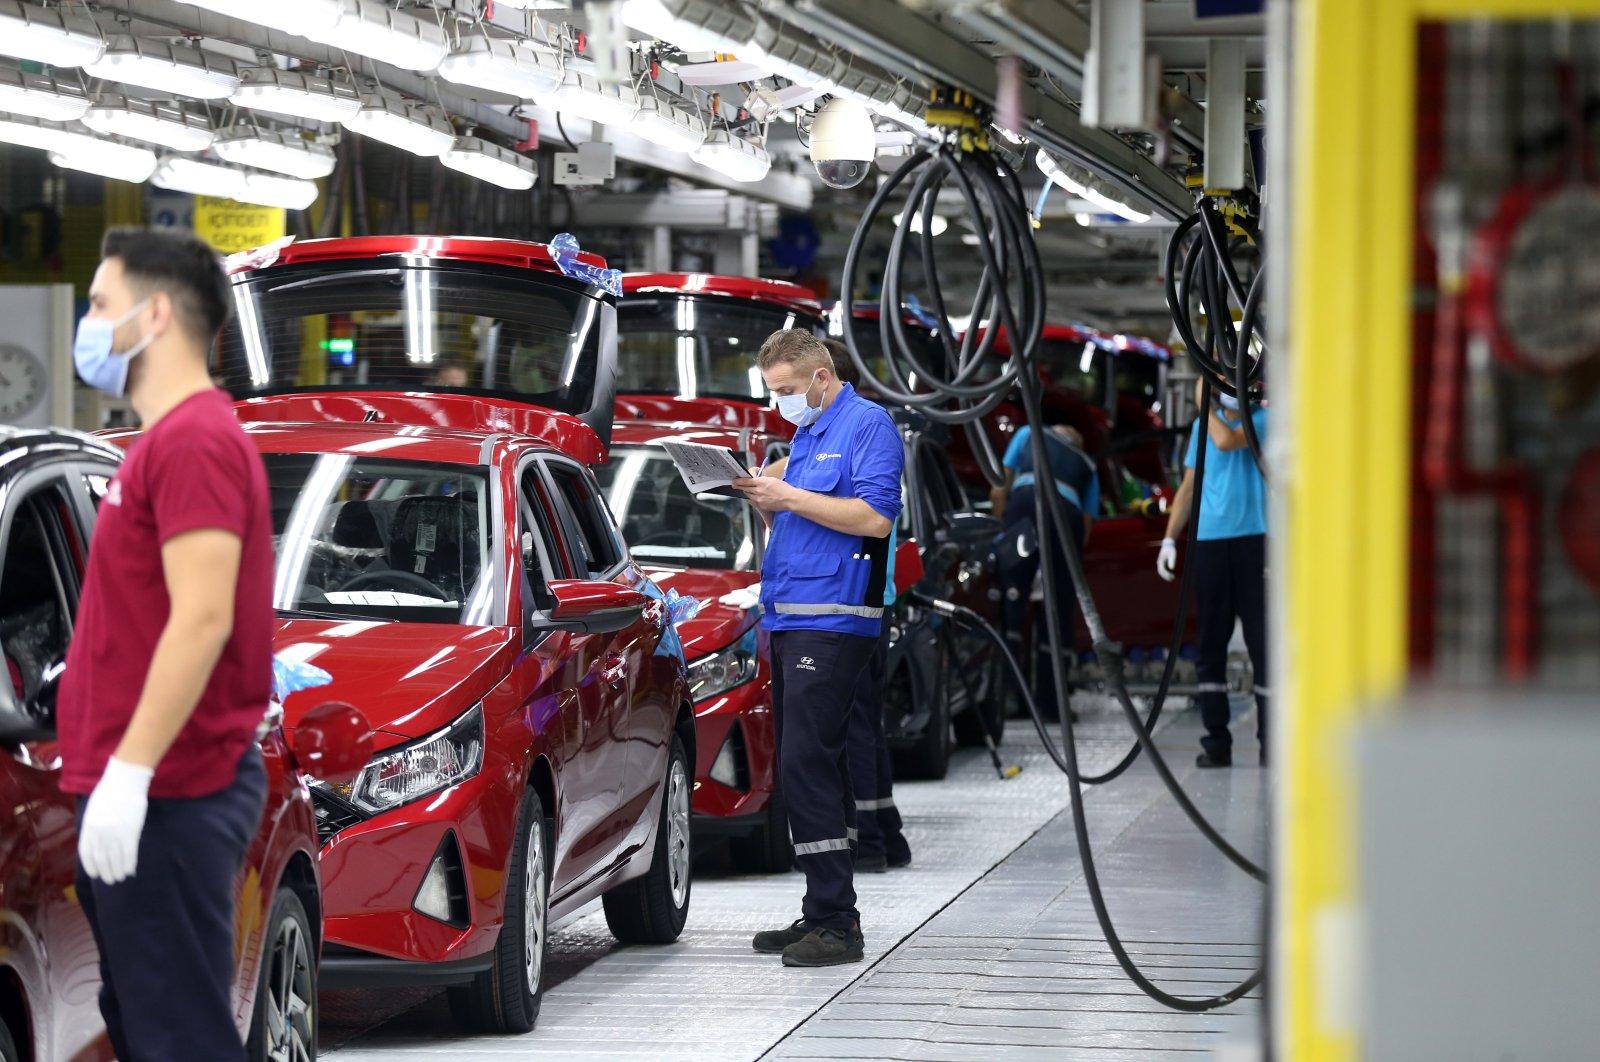 Workers are seen beside cars at Hyundai Assan's Izmit factory in northwestern Kocaeli, Turkey, Aug. 28, 2020. (AA Photo)